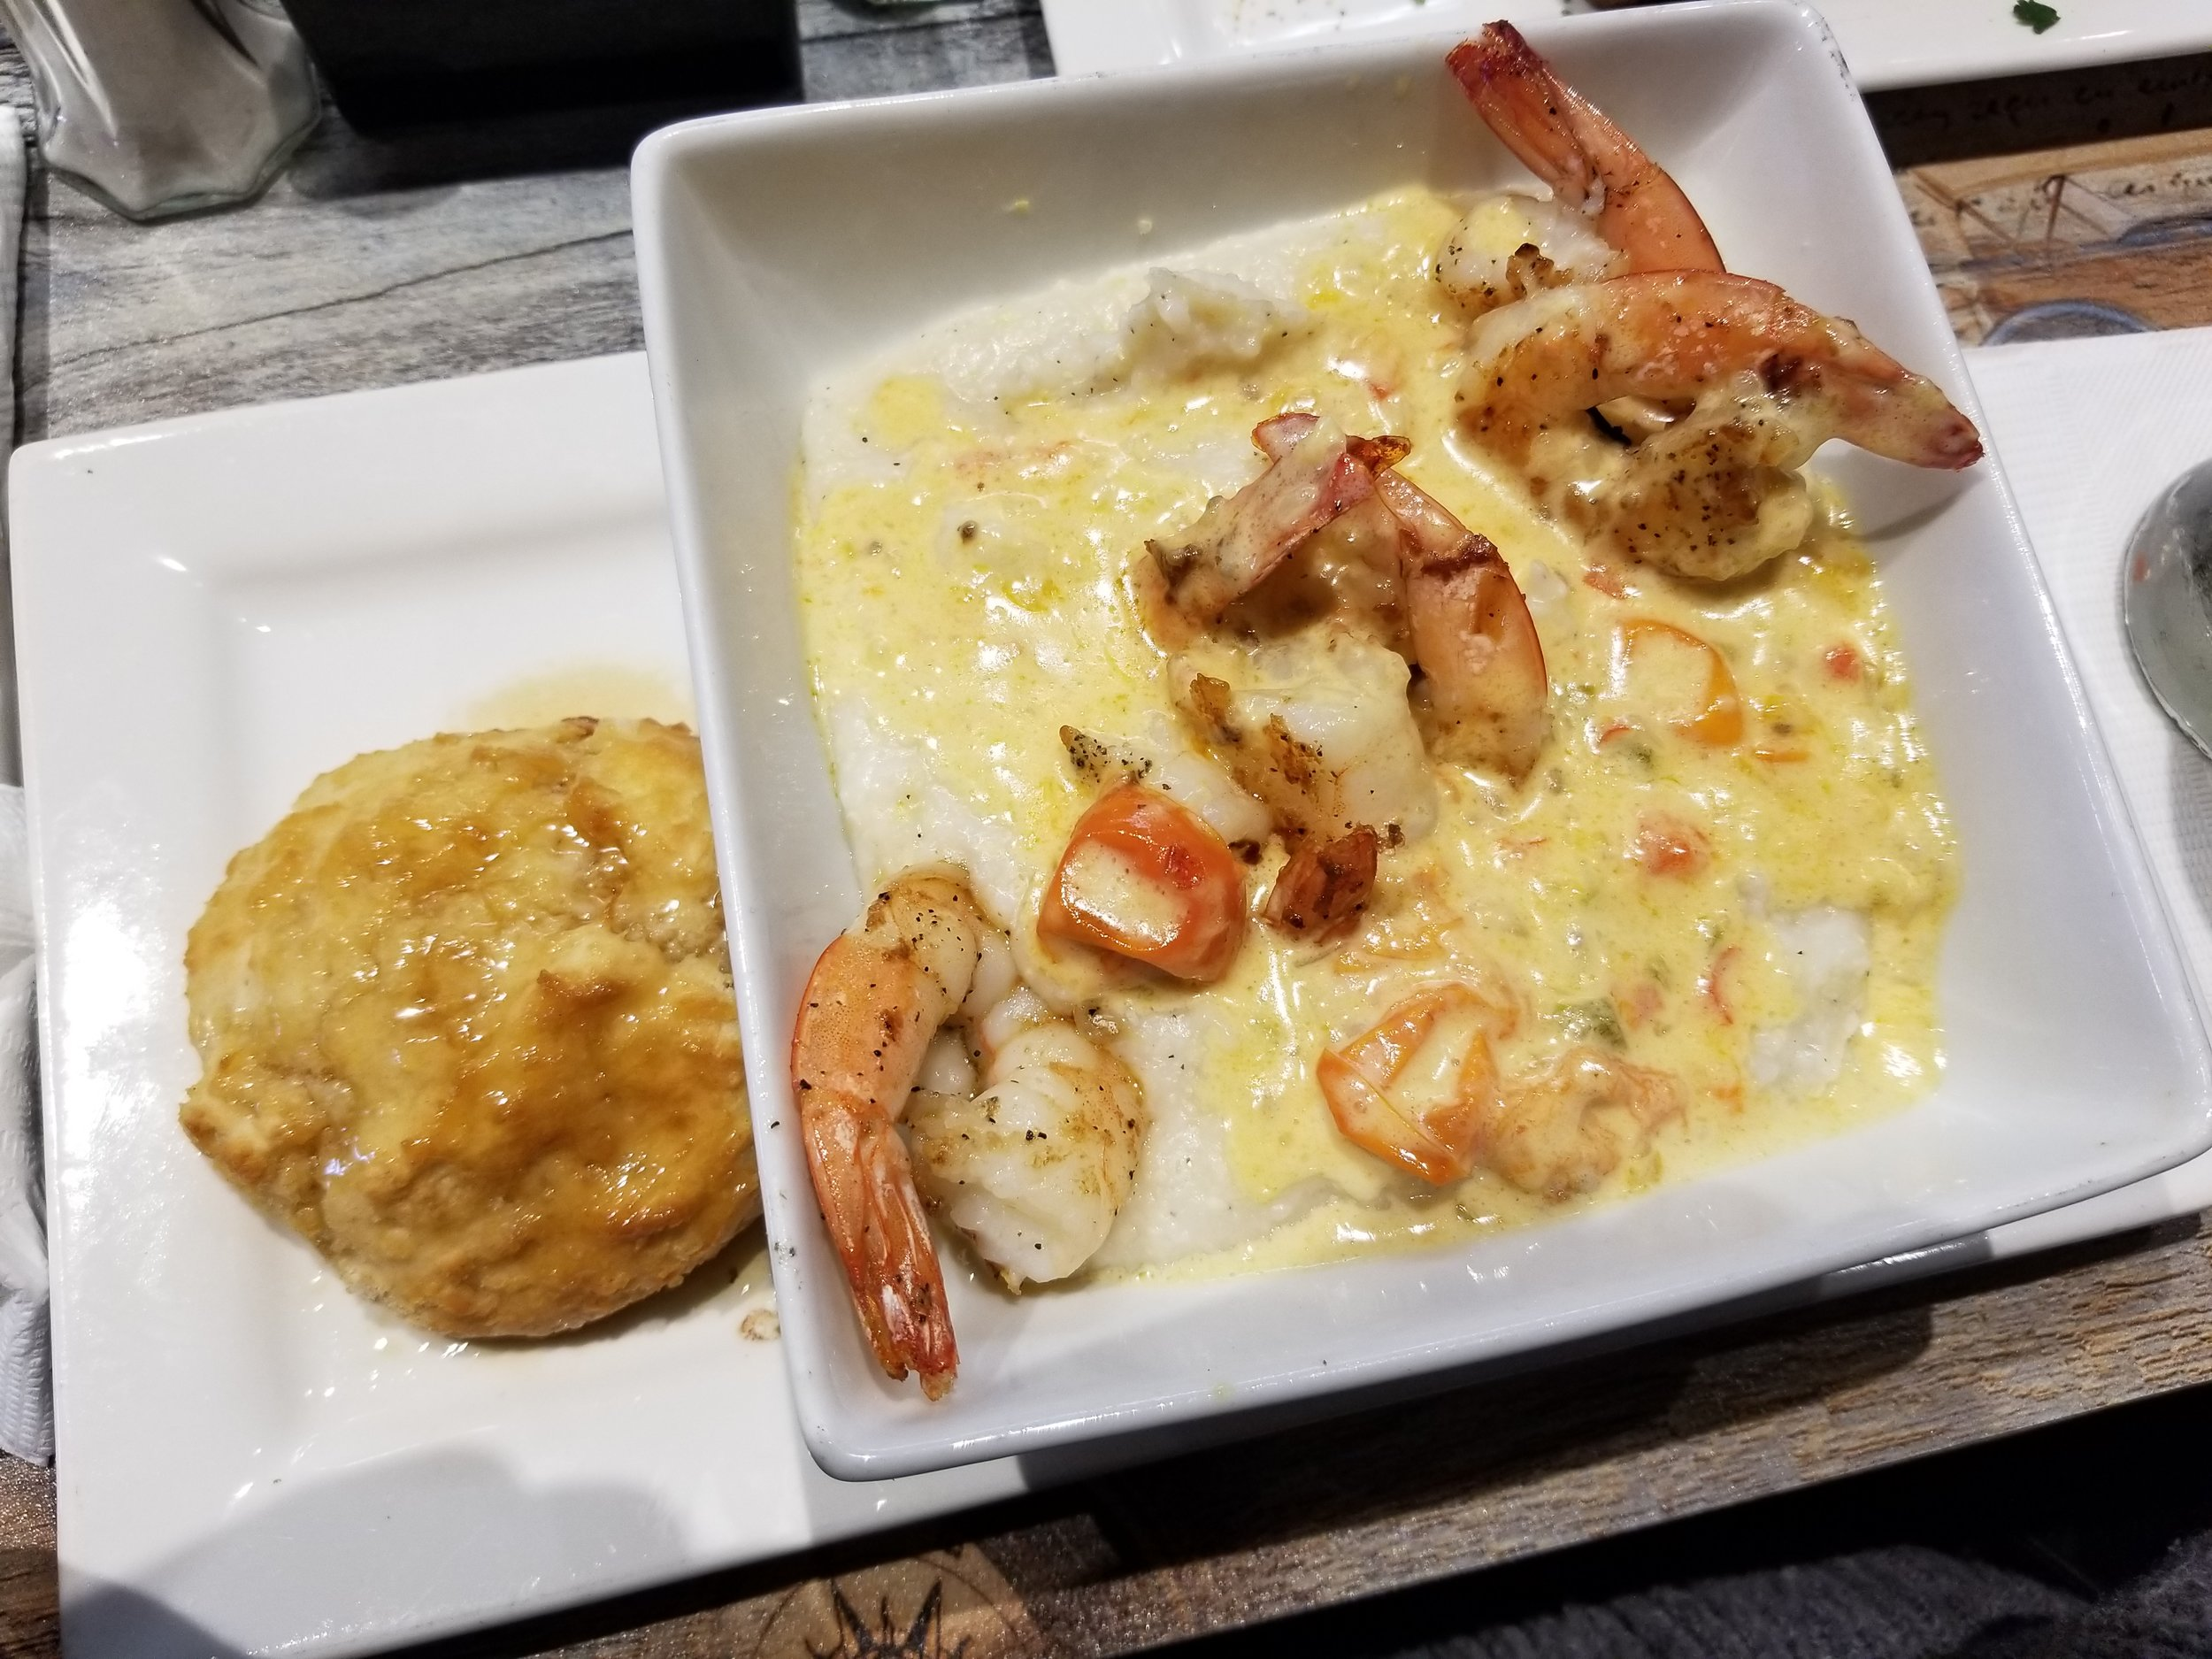 Shrimp & Grits- $15.95  Sautéed shrimp in Gocha's tasty garlic herb tomato roux served over creamy grits.